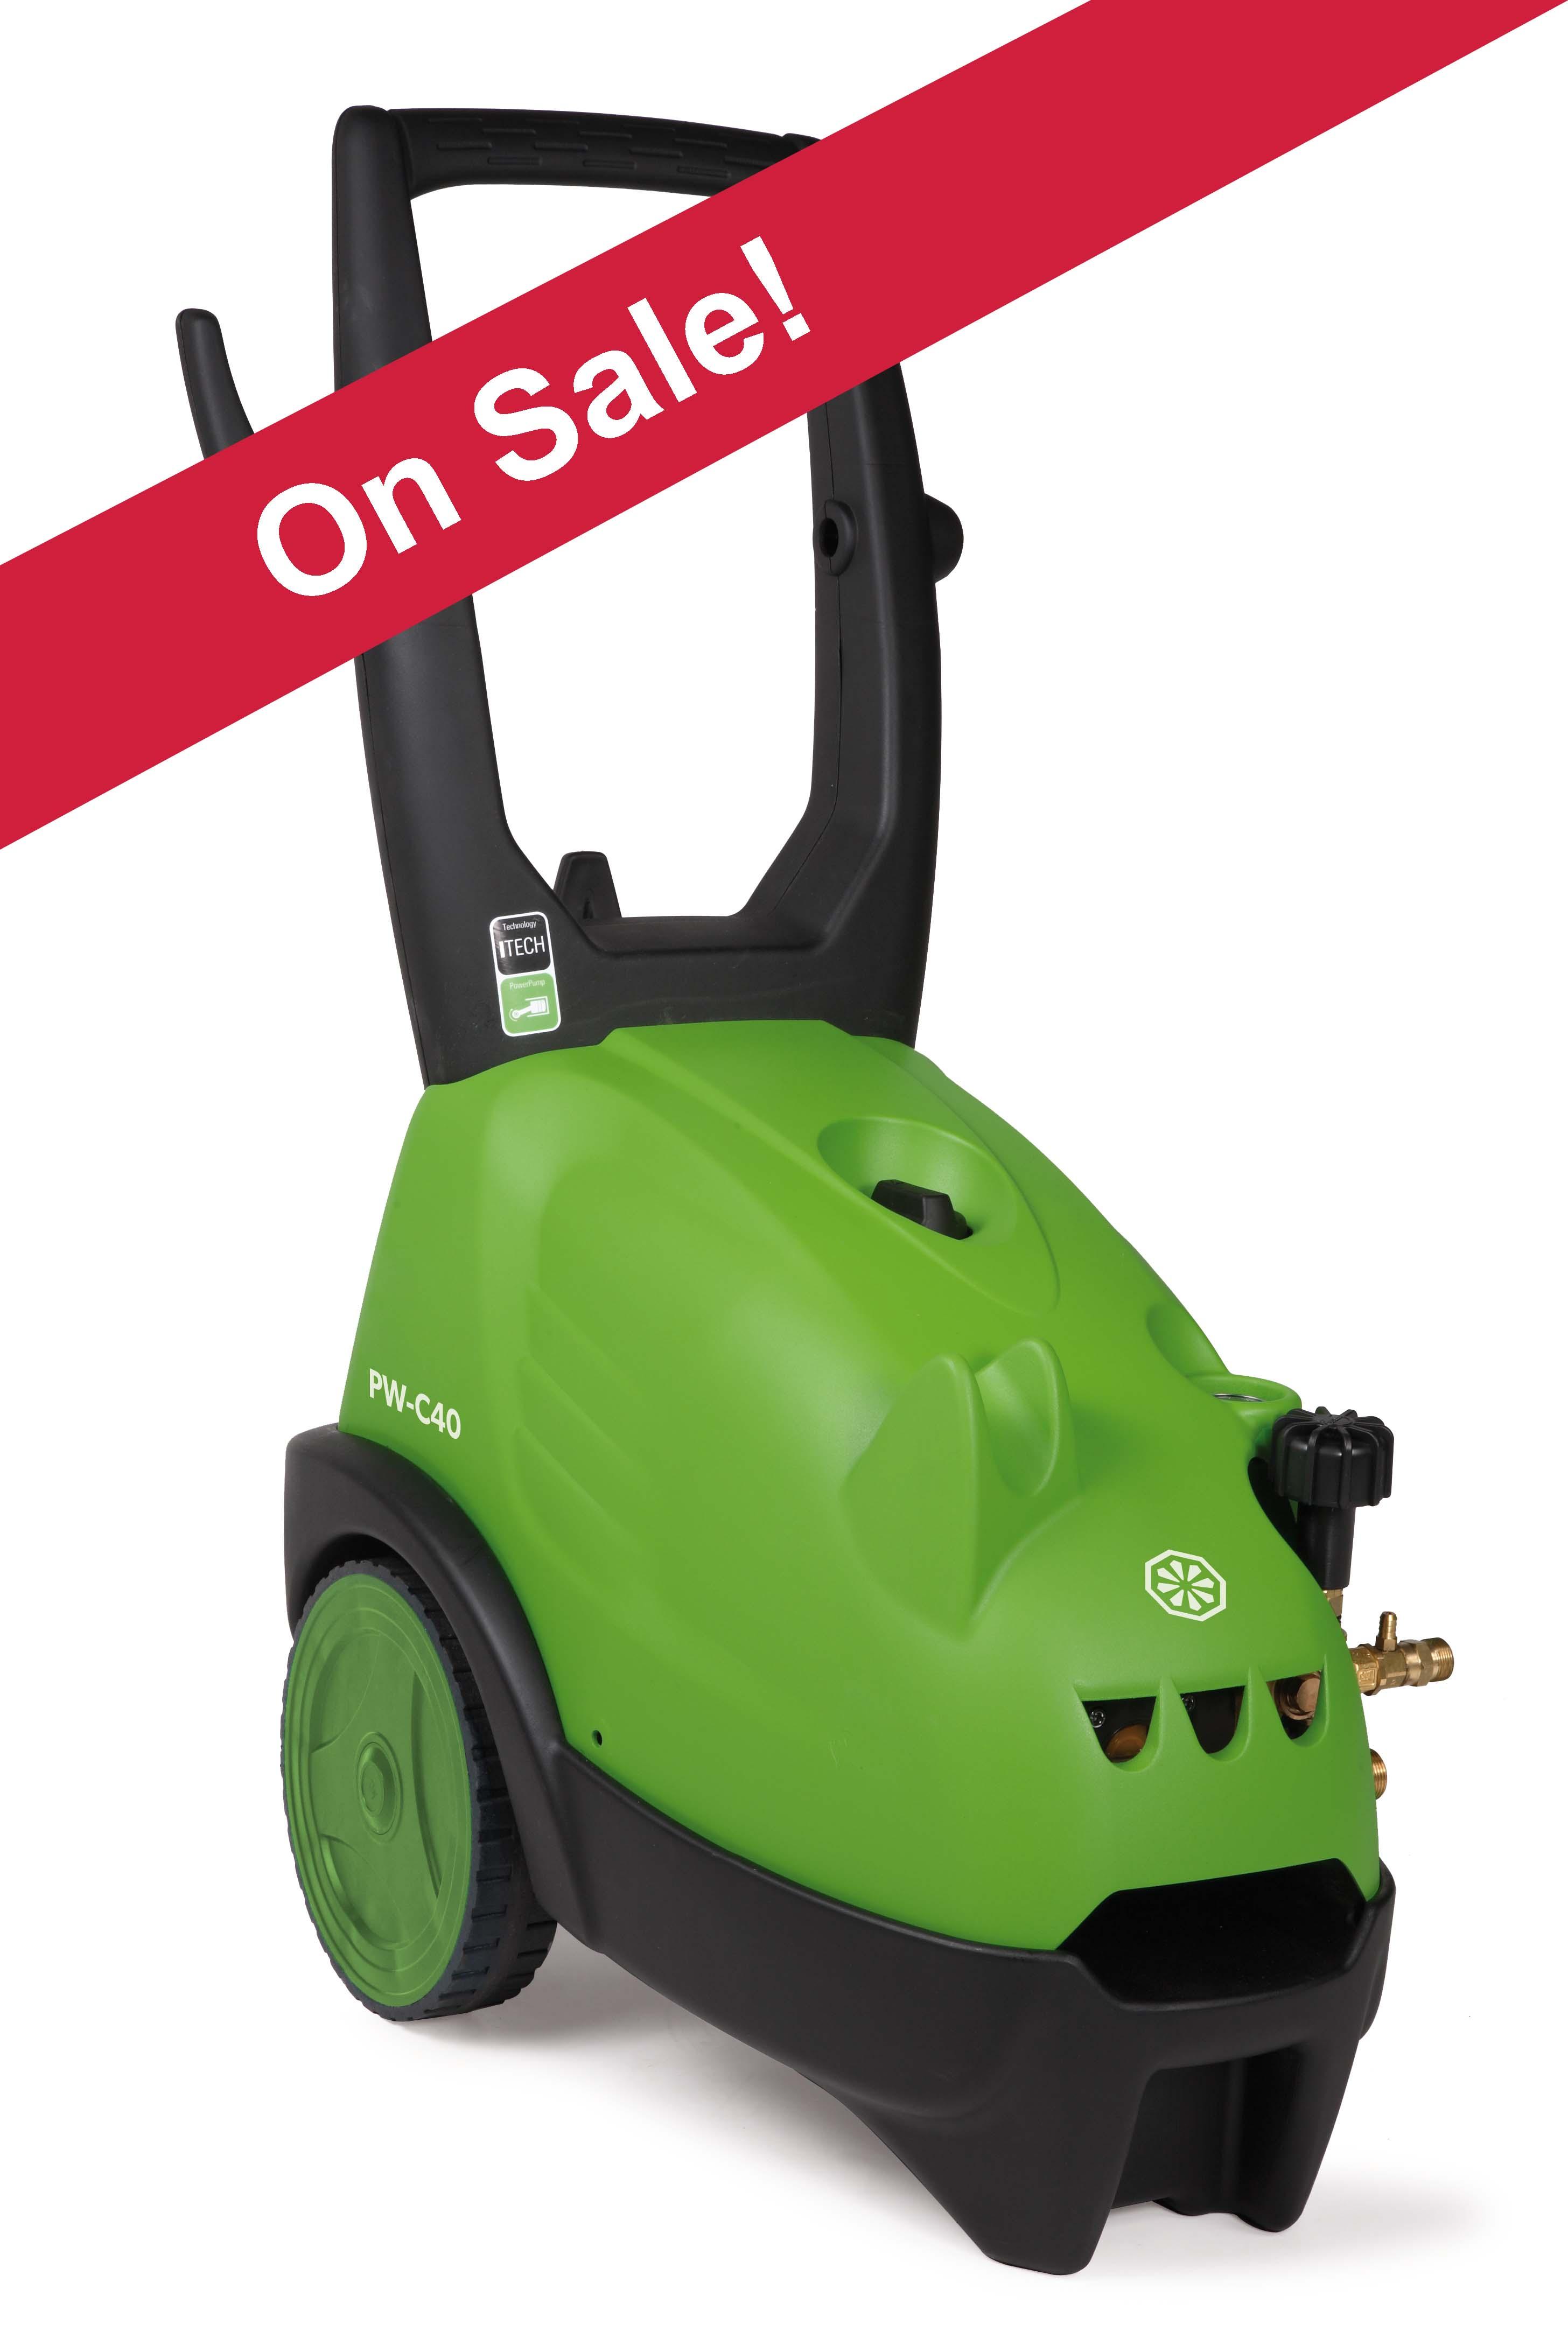 PW C40 High Pressure Cleaner On Sale